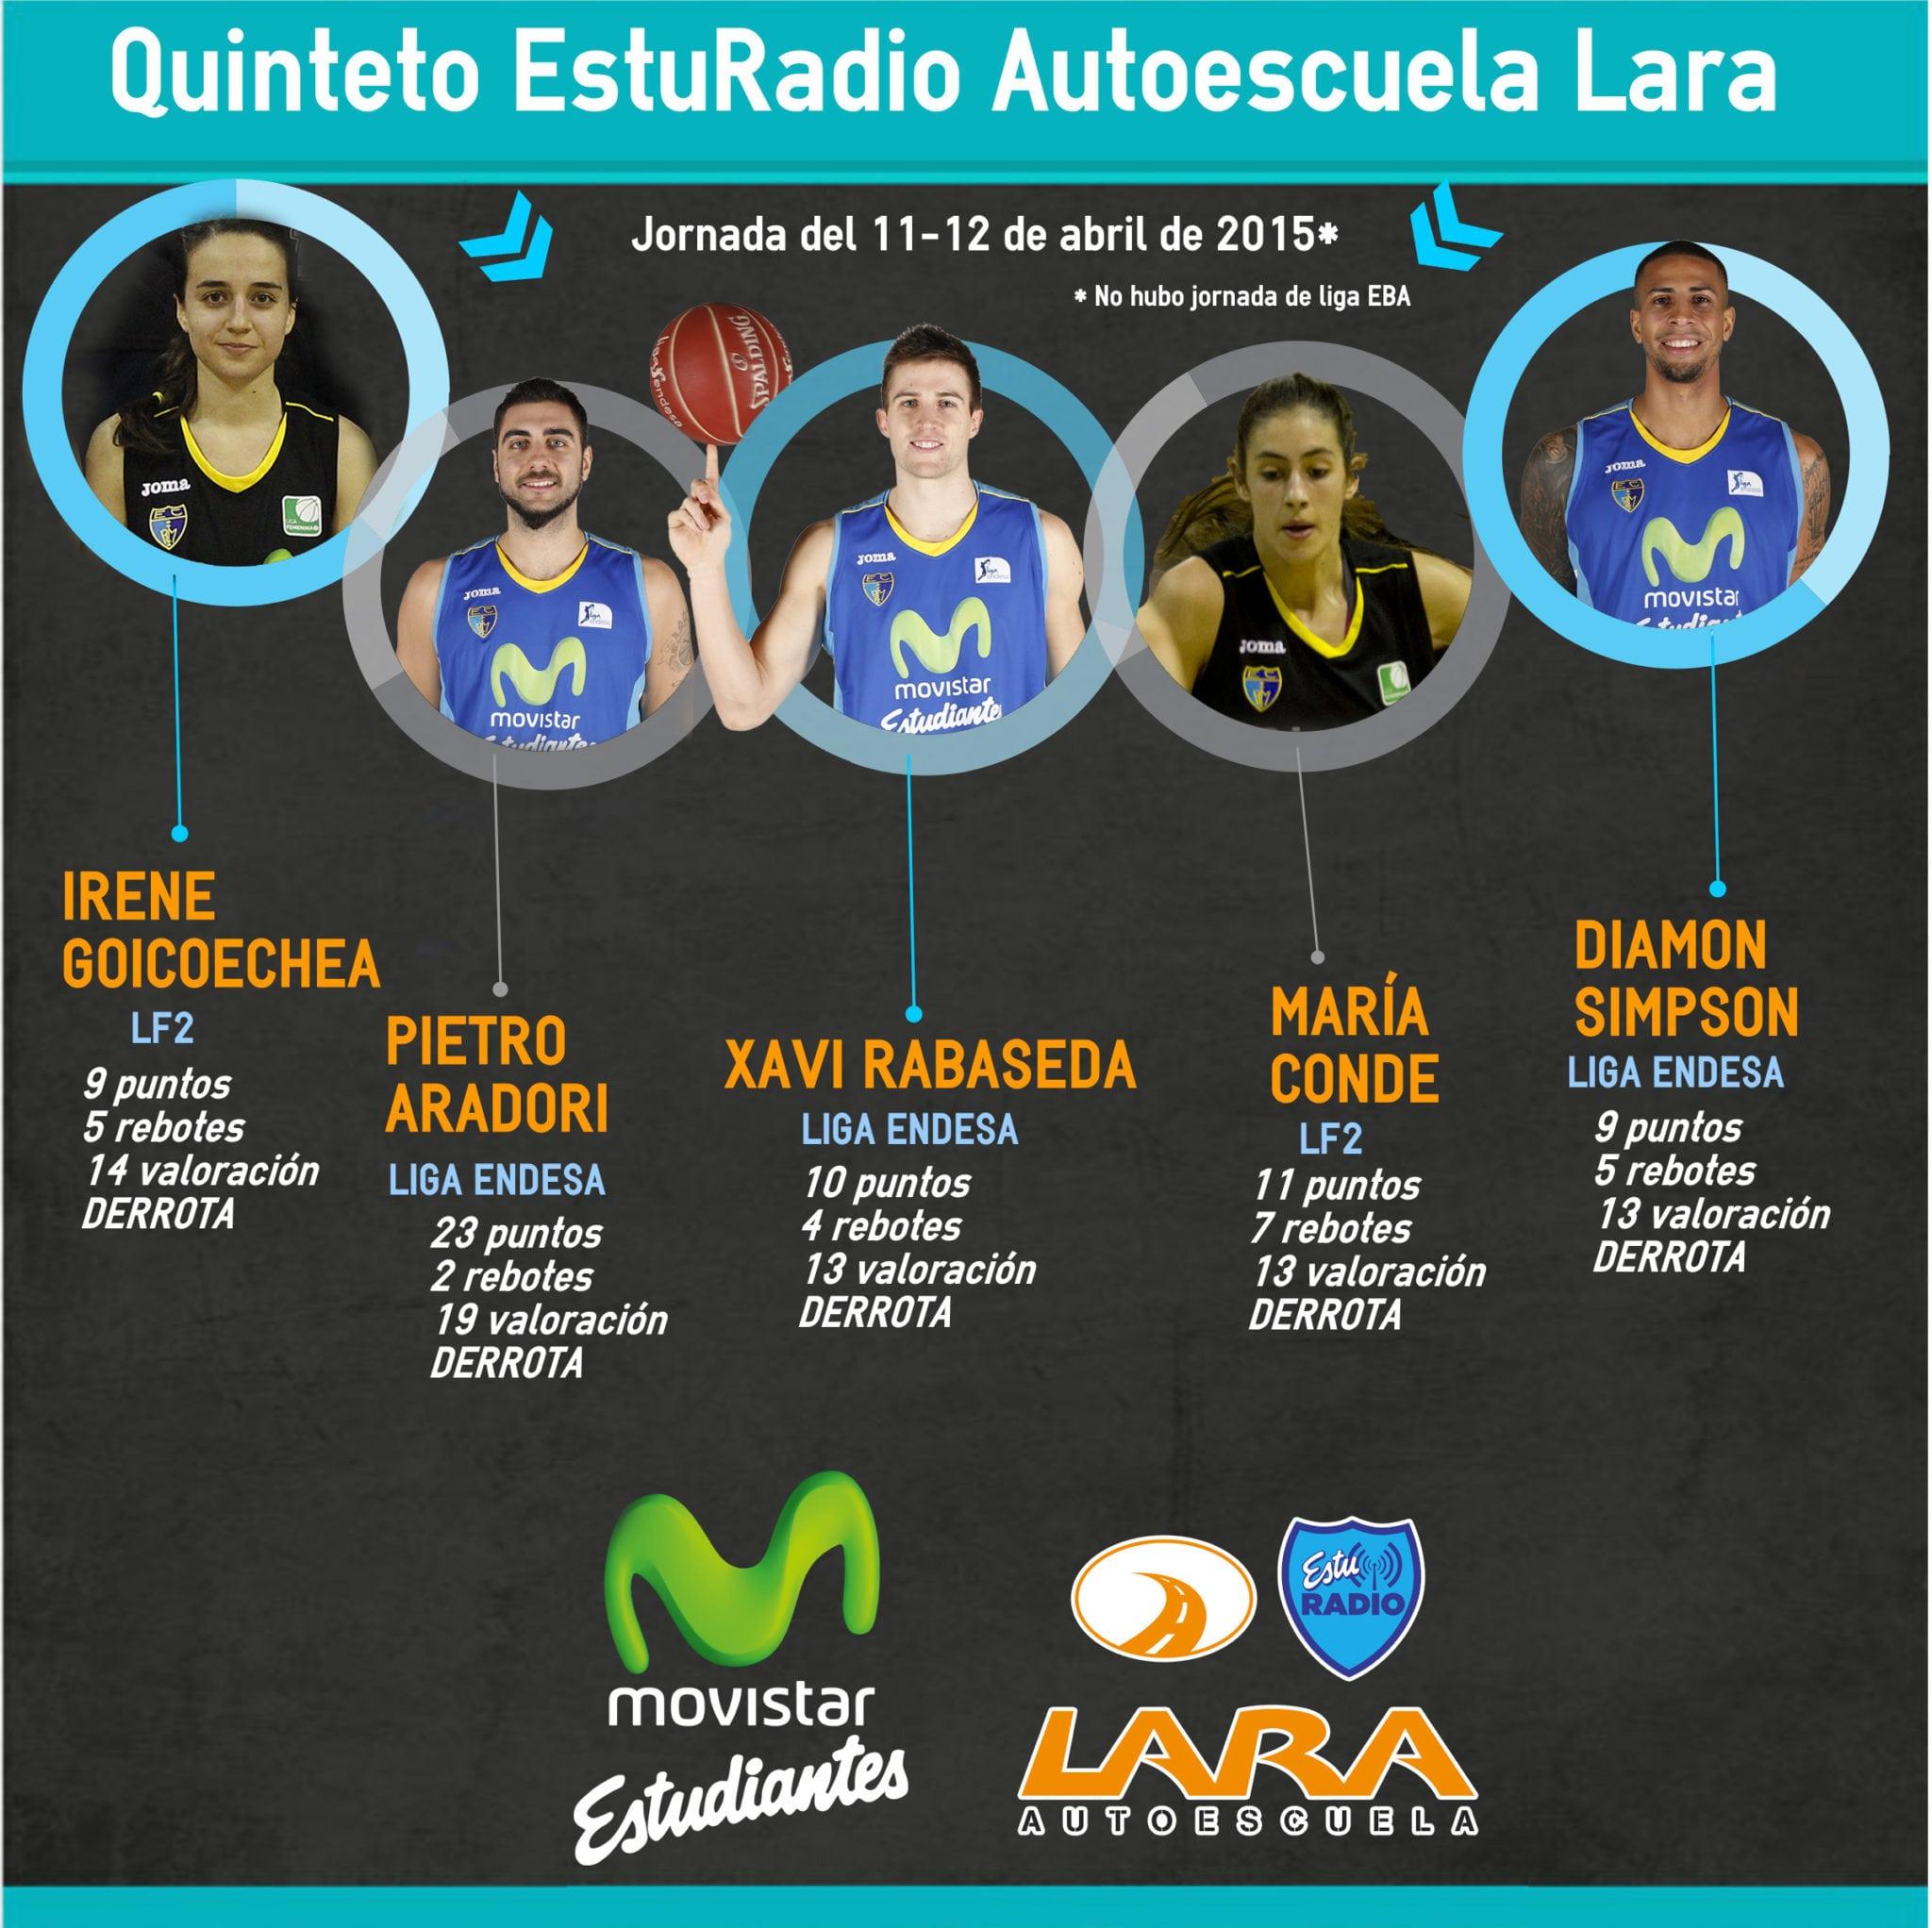 20º Quinteto EstuRadio Autoescuela Lara: Irene Goicoechea, Pietro Aradori, Xavi Rabaseda, María Conde y Diamon Simpson